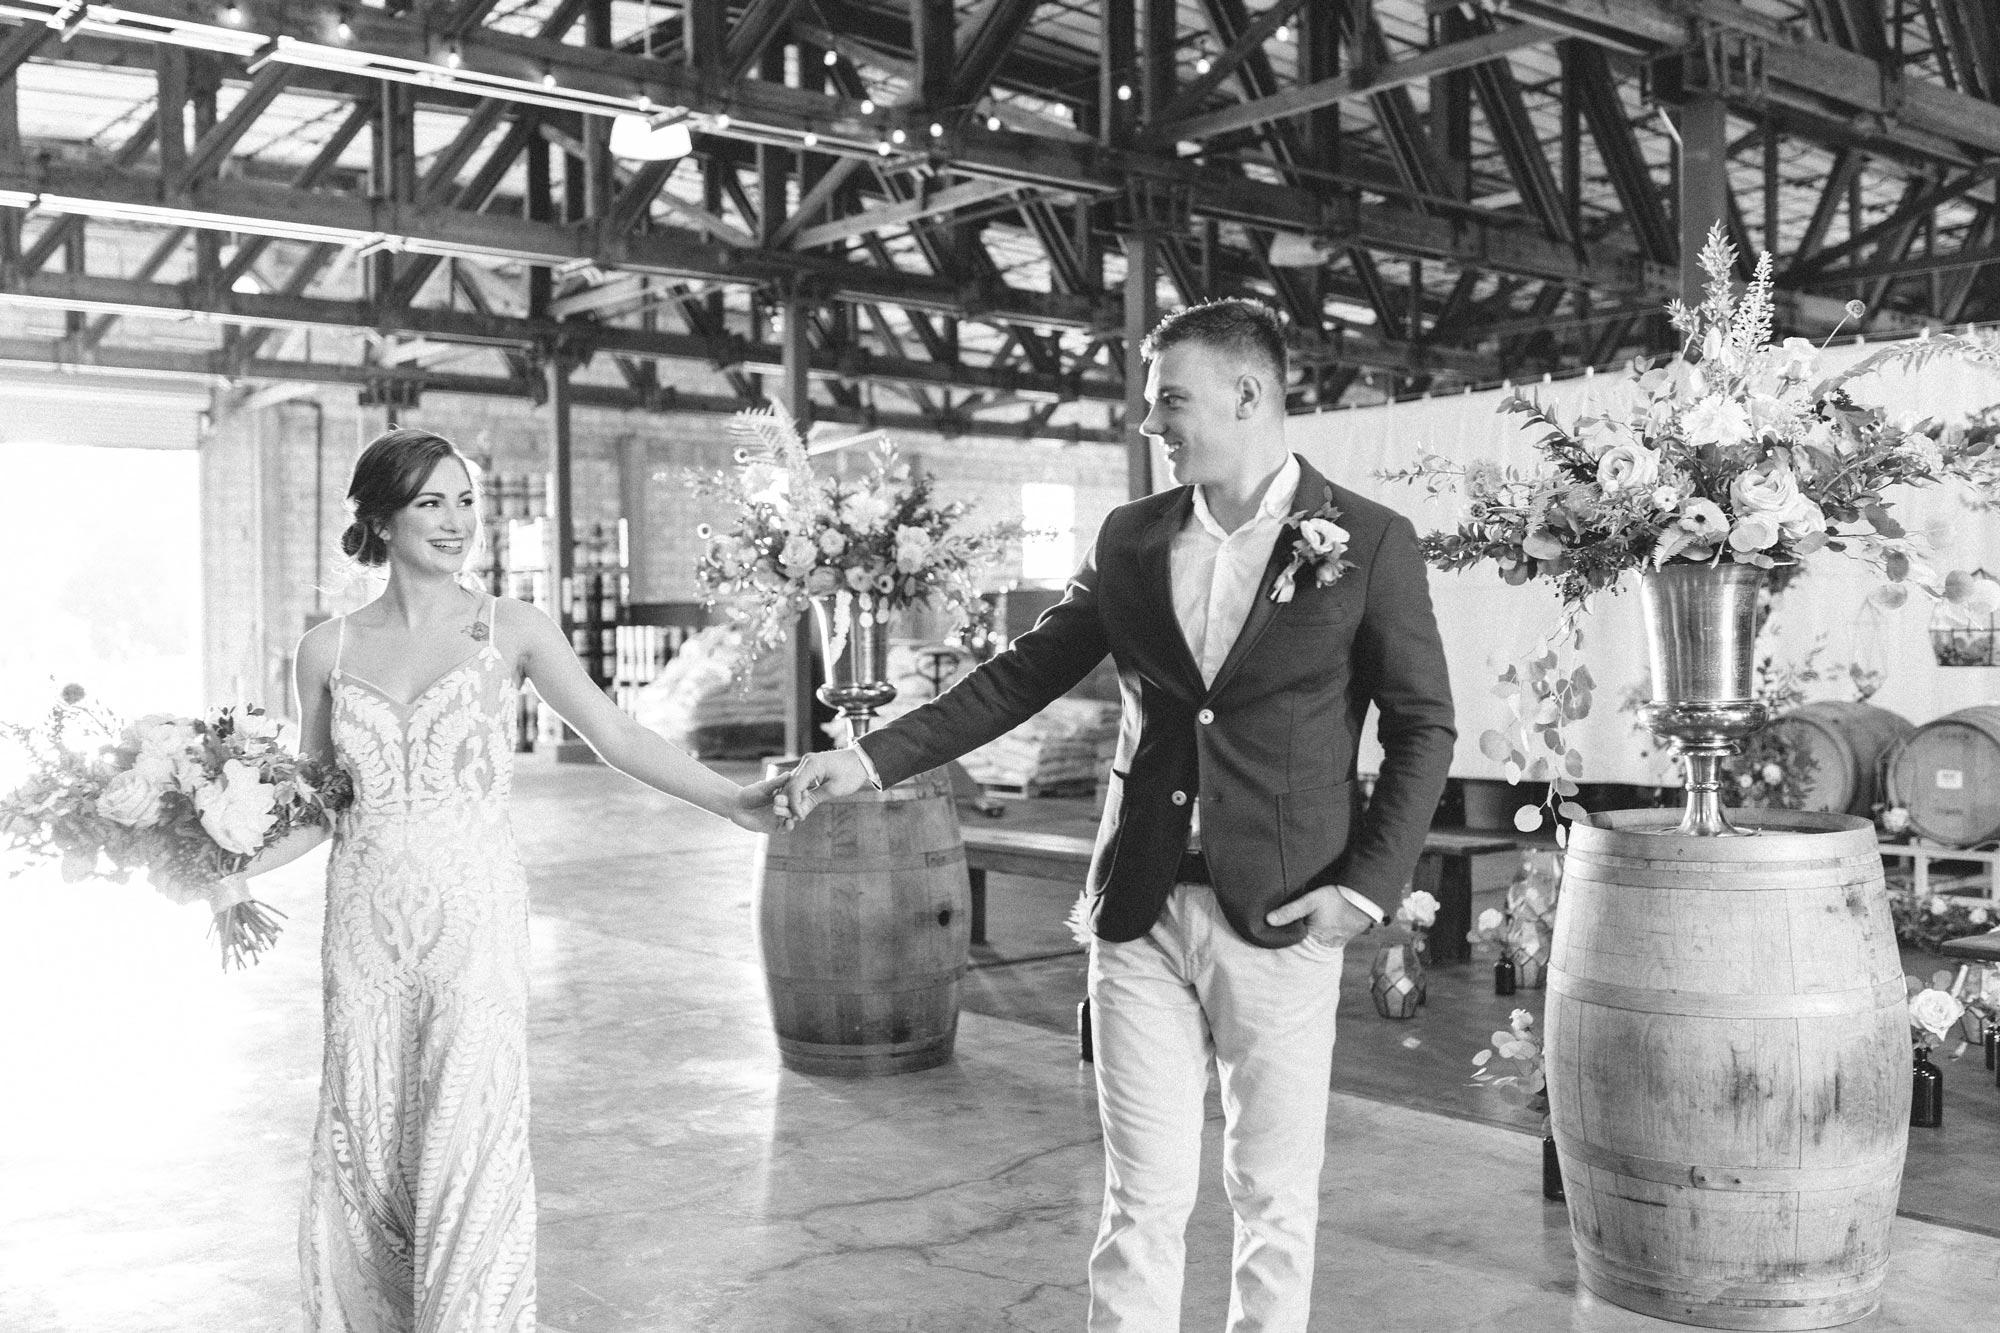 WalkingTreeBrewery_EventSpaceRentals_Wedding.jpg